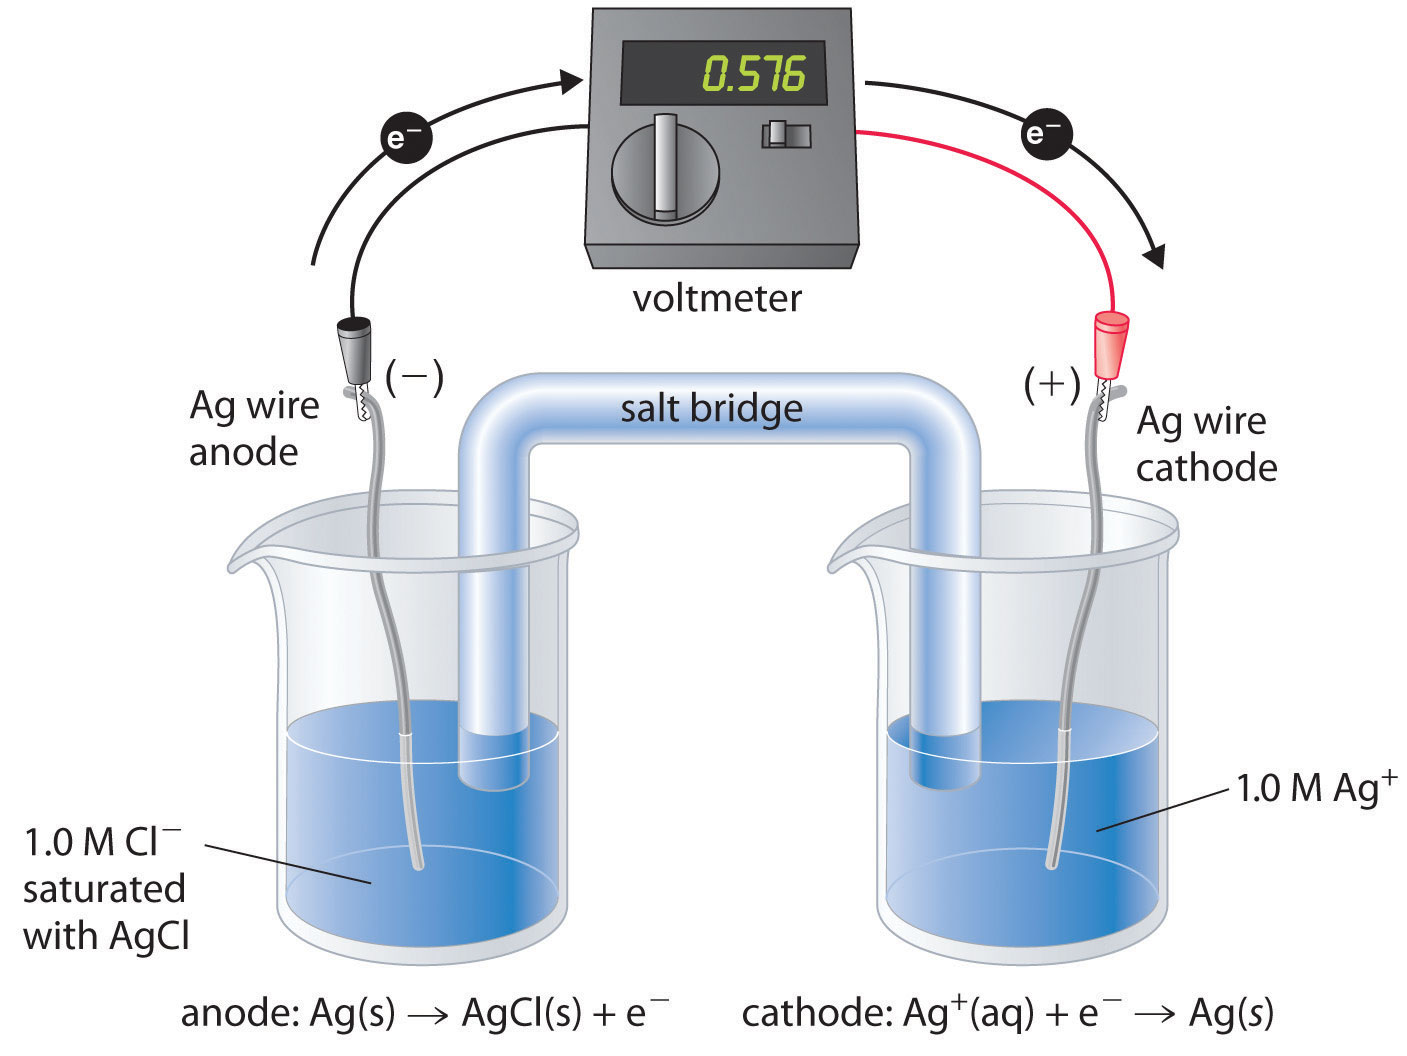 6b00017f10bbc22f61ecadb2f59aa3b9g http2012booksrdbucketbooksprinciples of general chemistry v10msection236b00017f10bbc22f61ecadb2f59aa3b9g ccuart Image collections